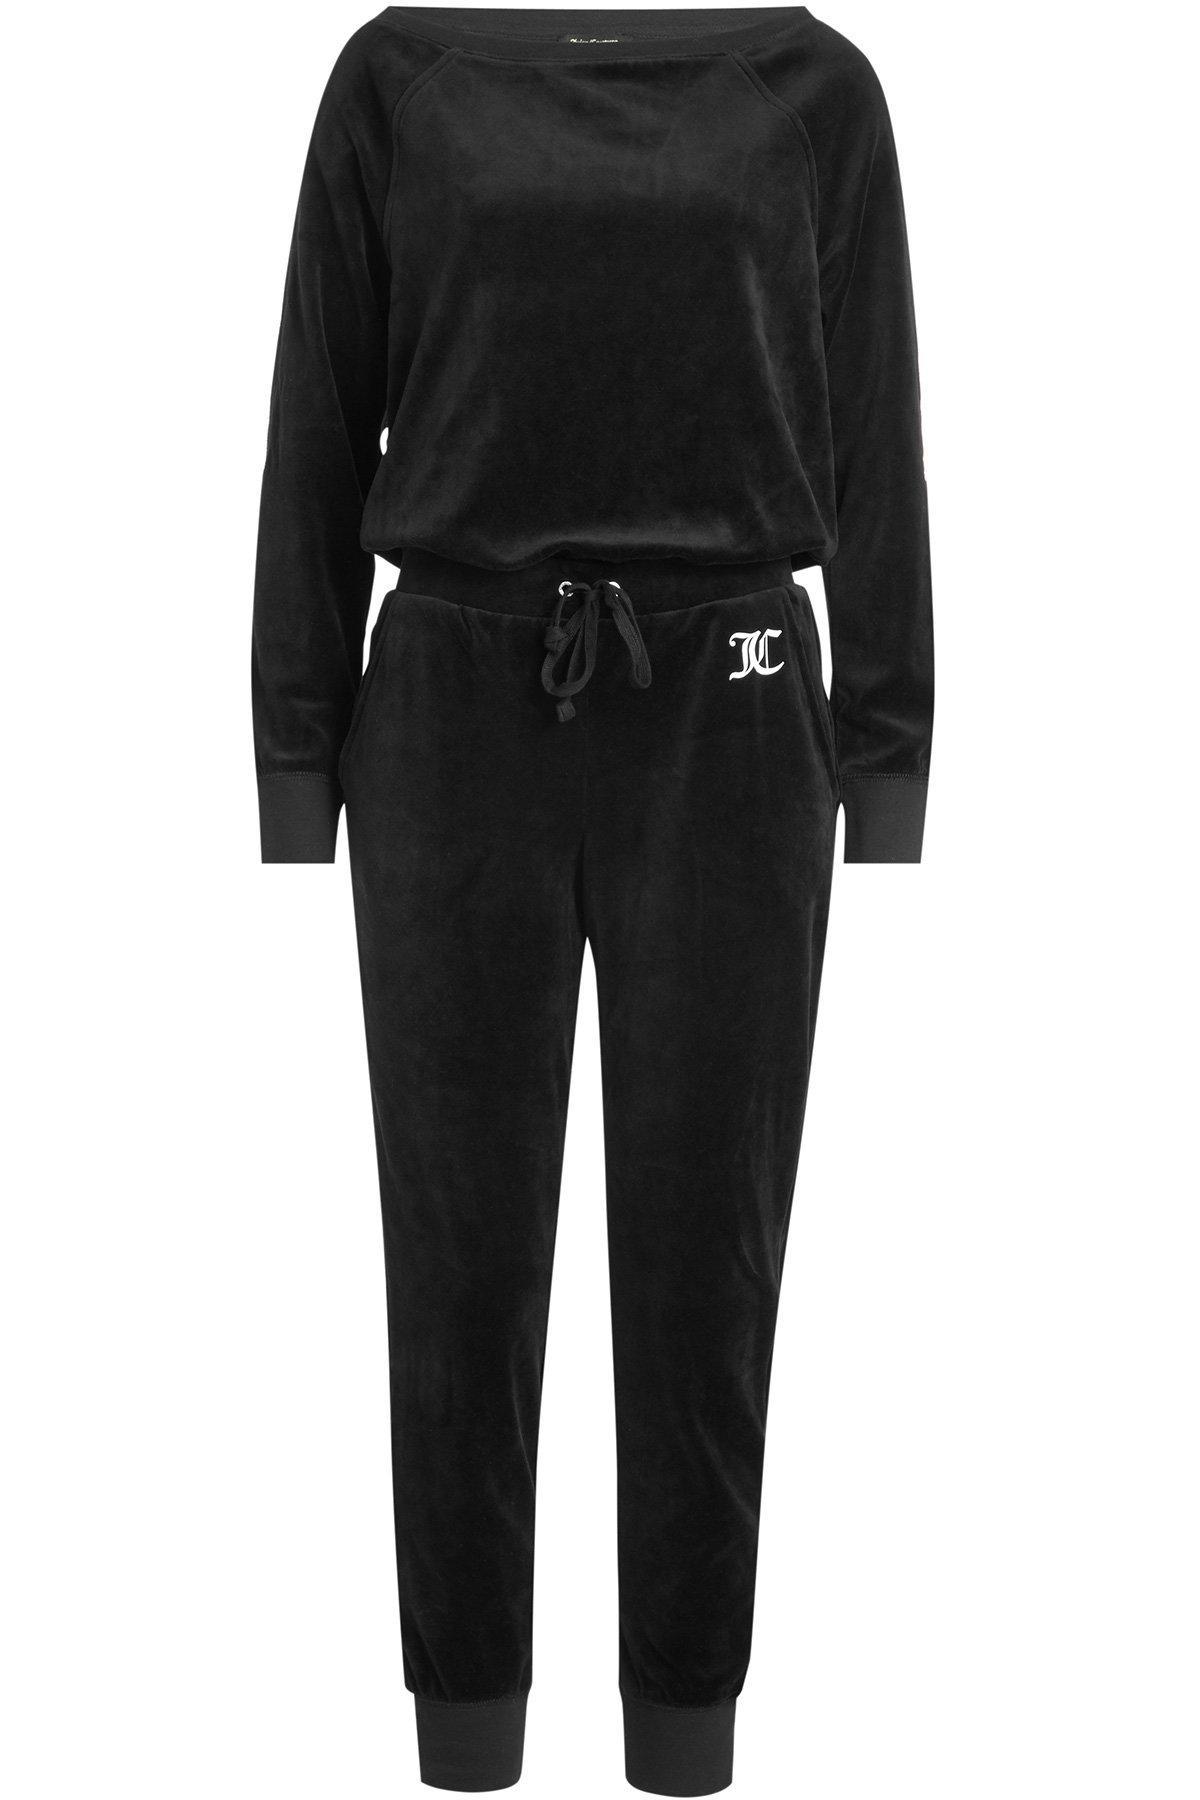 Juicy Couture Velour Jumpsuit In Black